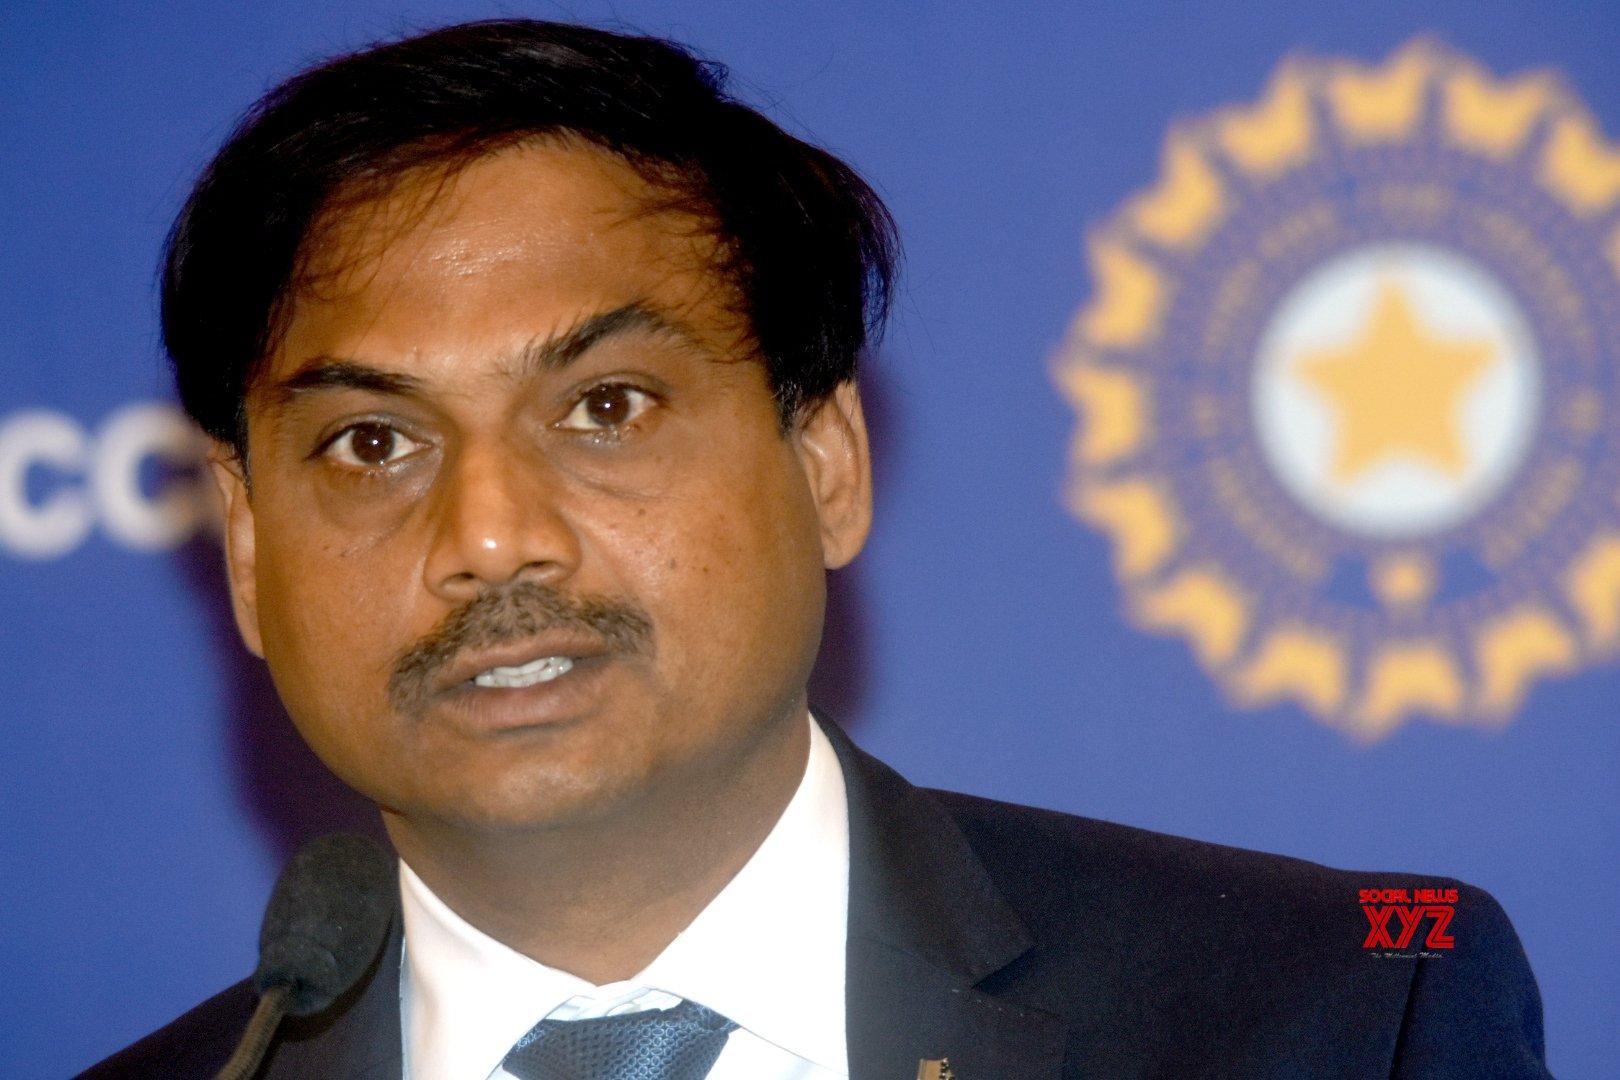 Grooming 60-80 players has helped Indian cricket: MSK Prasad